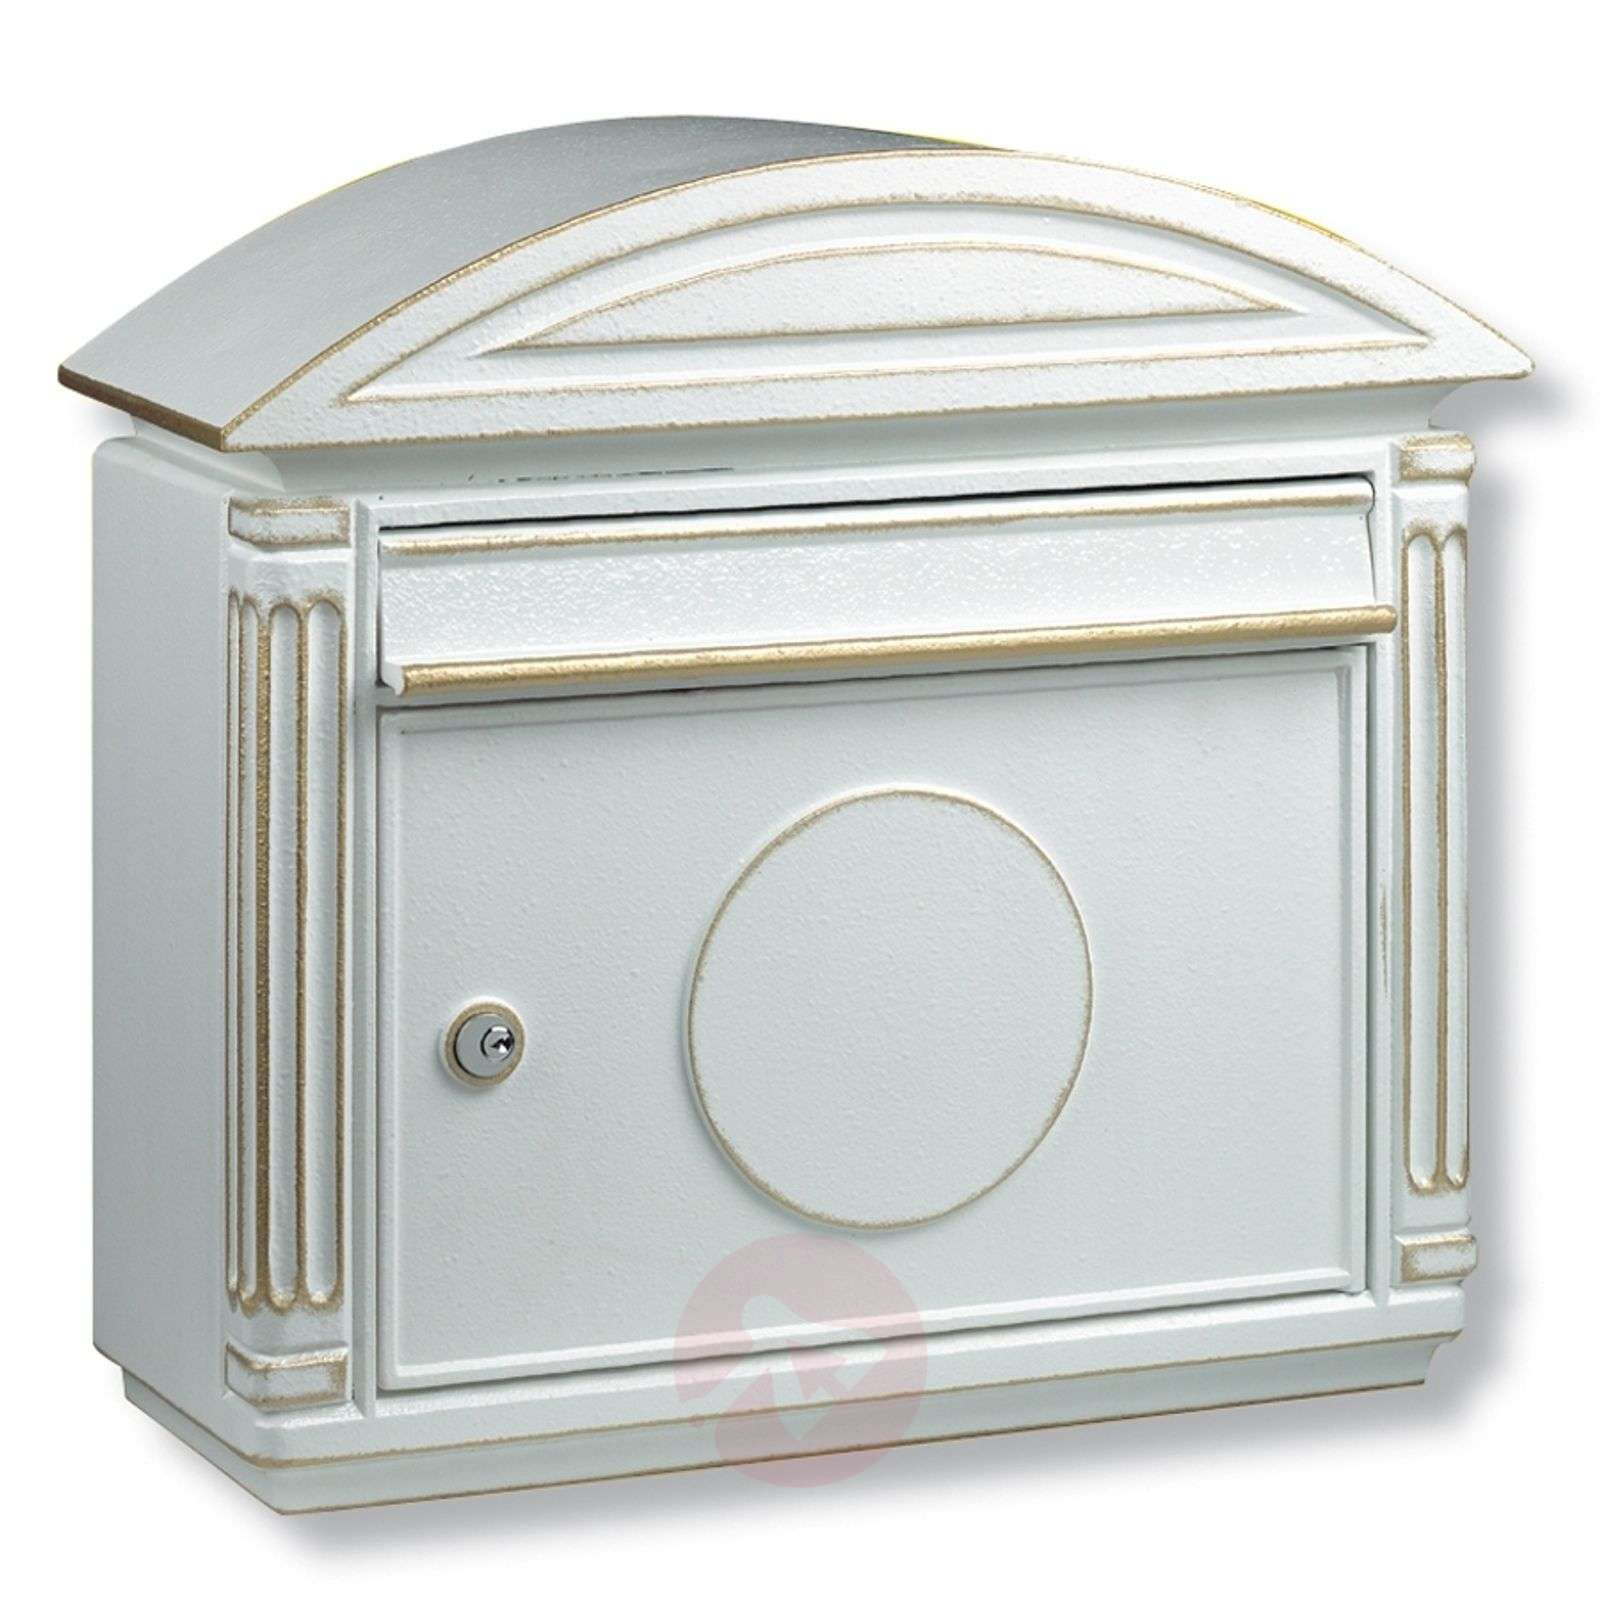 Venezia-postilaatikko painevalualumiinia, valk.-1532047-01